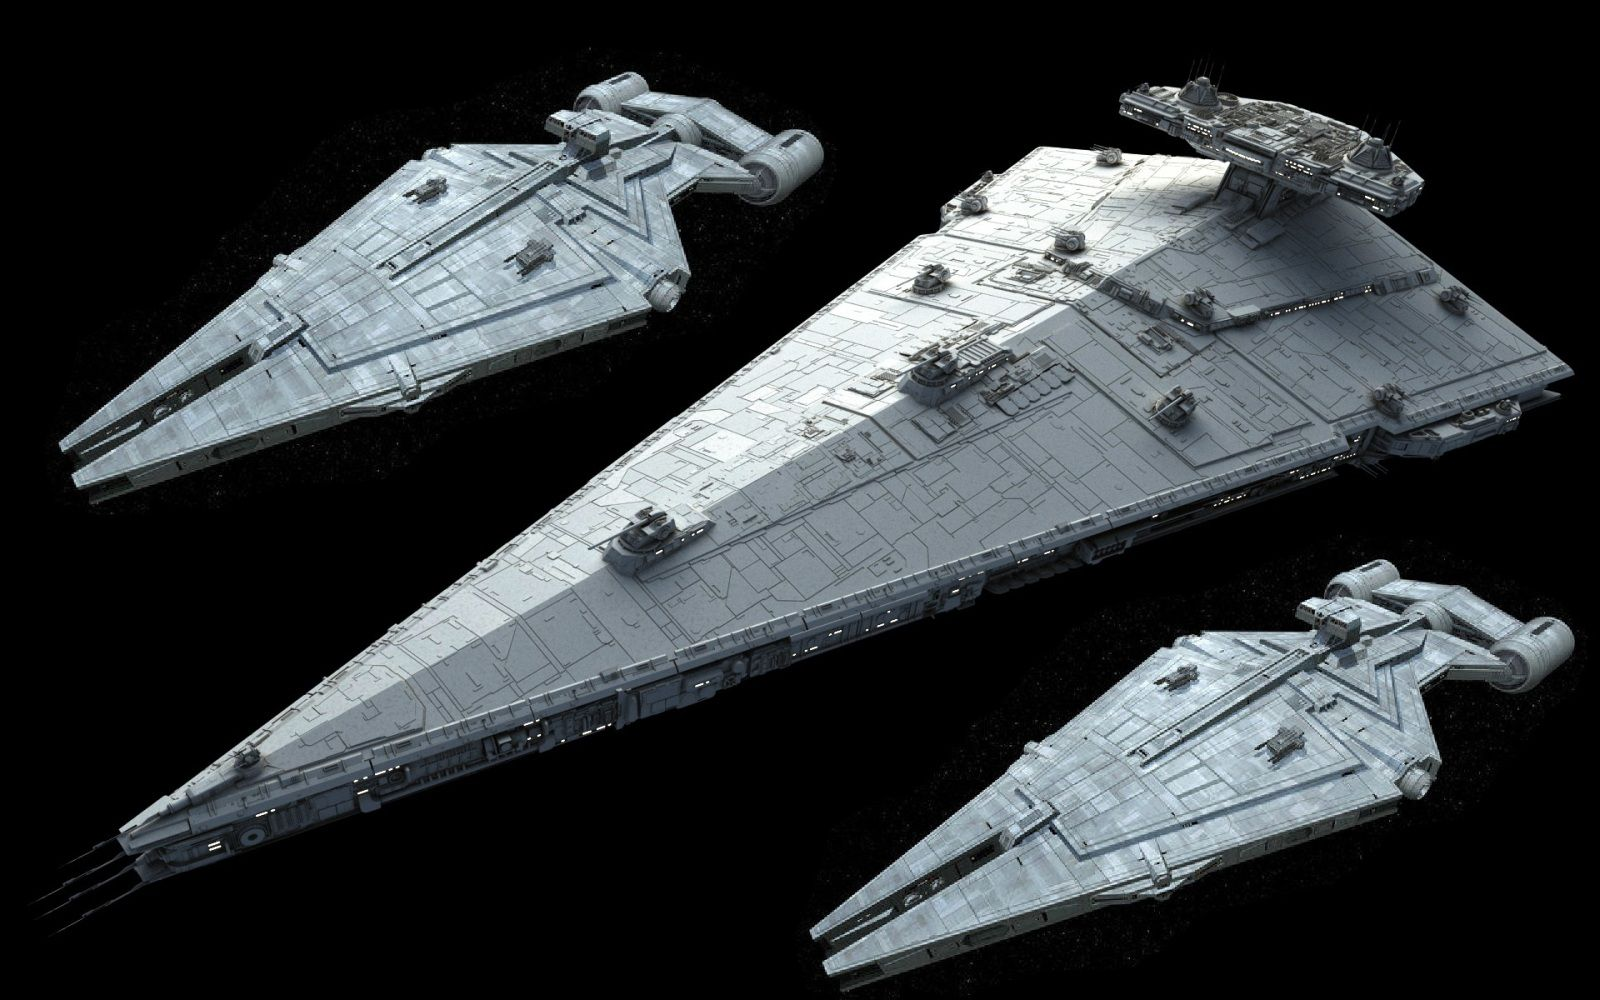 Arquitens Class Light Cruiser Size Spacecraft Star Wars